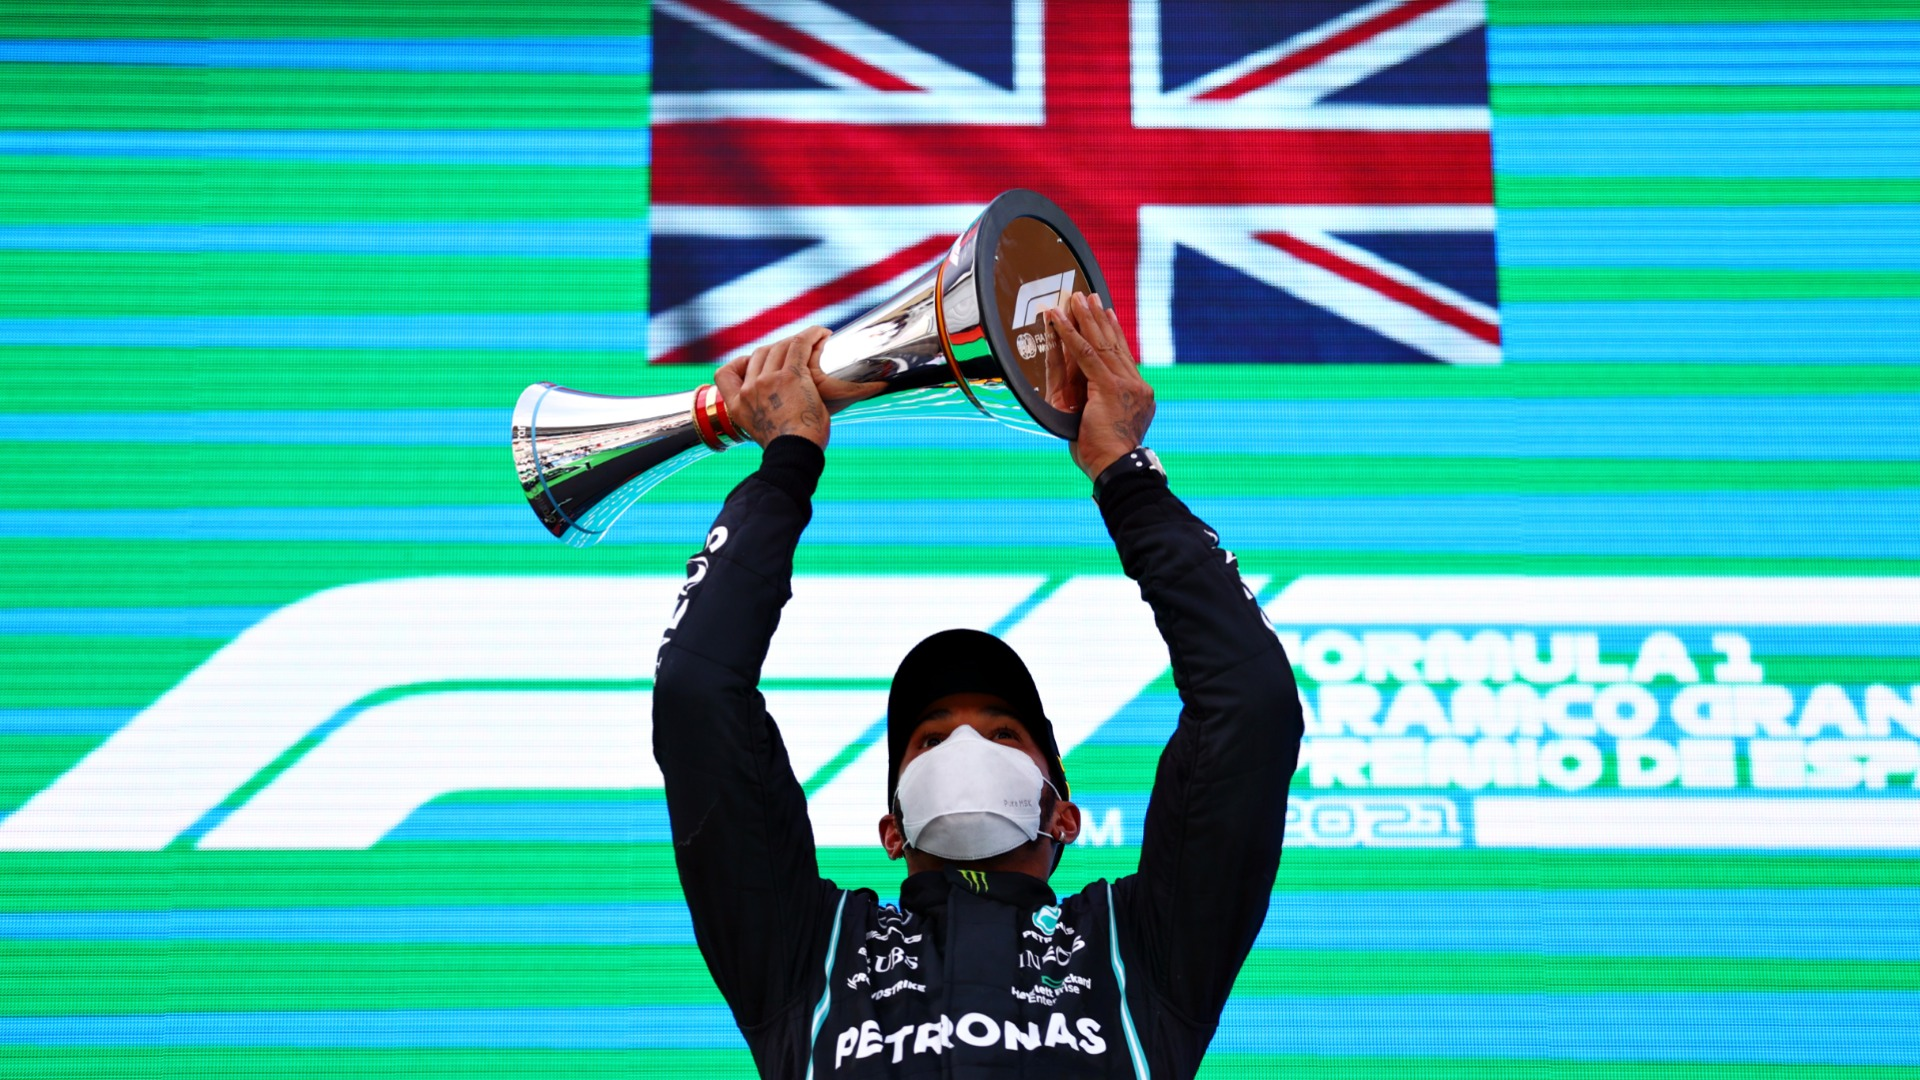 Hamilton delighted to cash in on Mercedes' Spanish Grand Prix 'gamble'